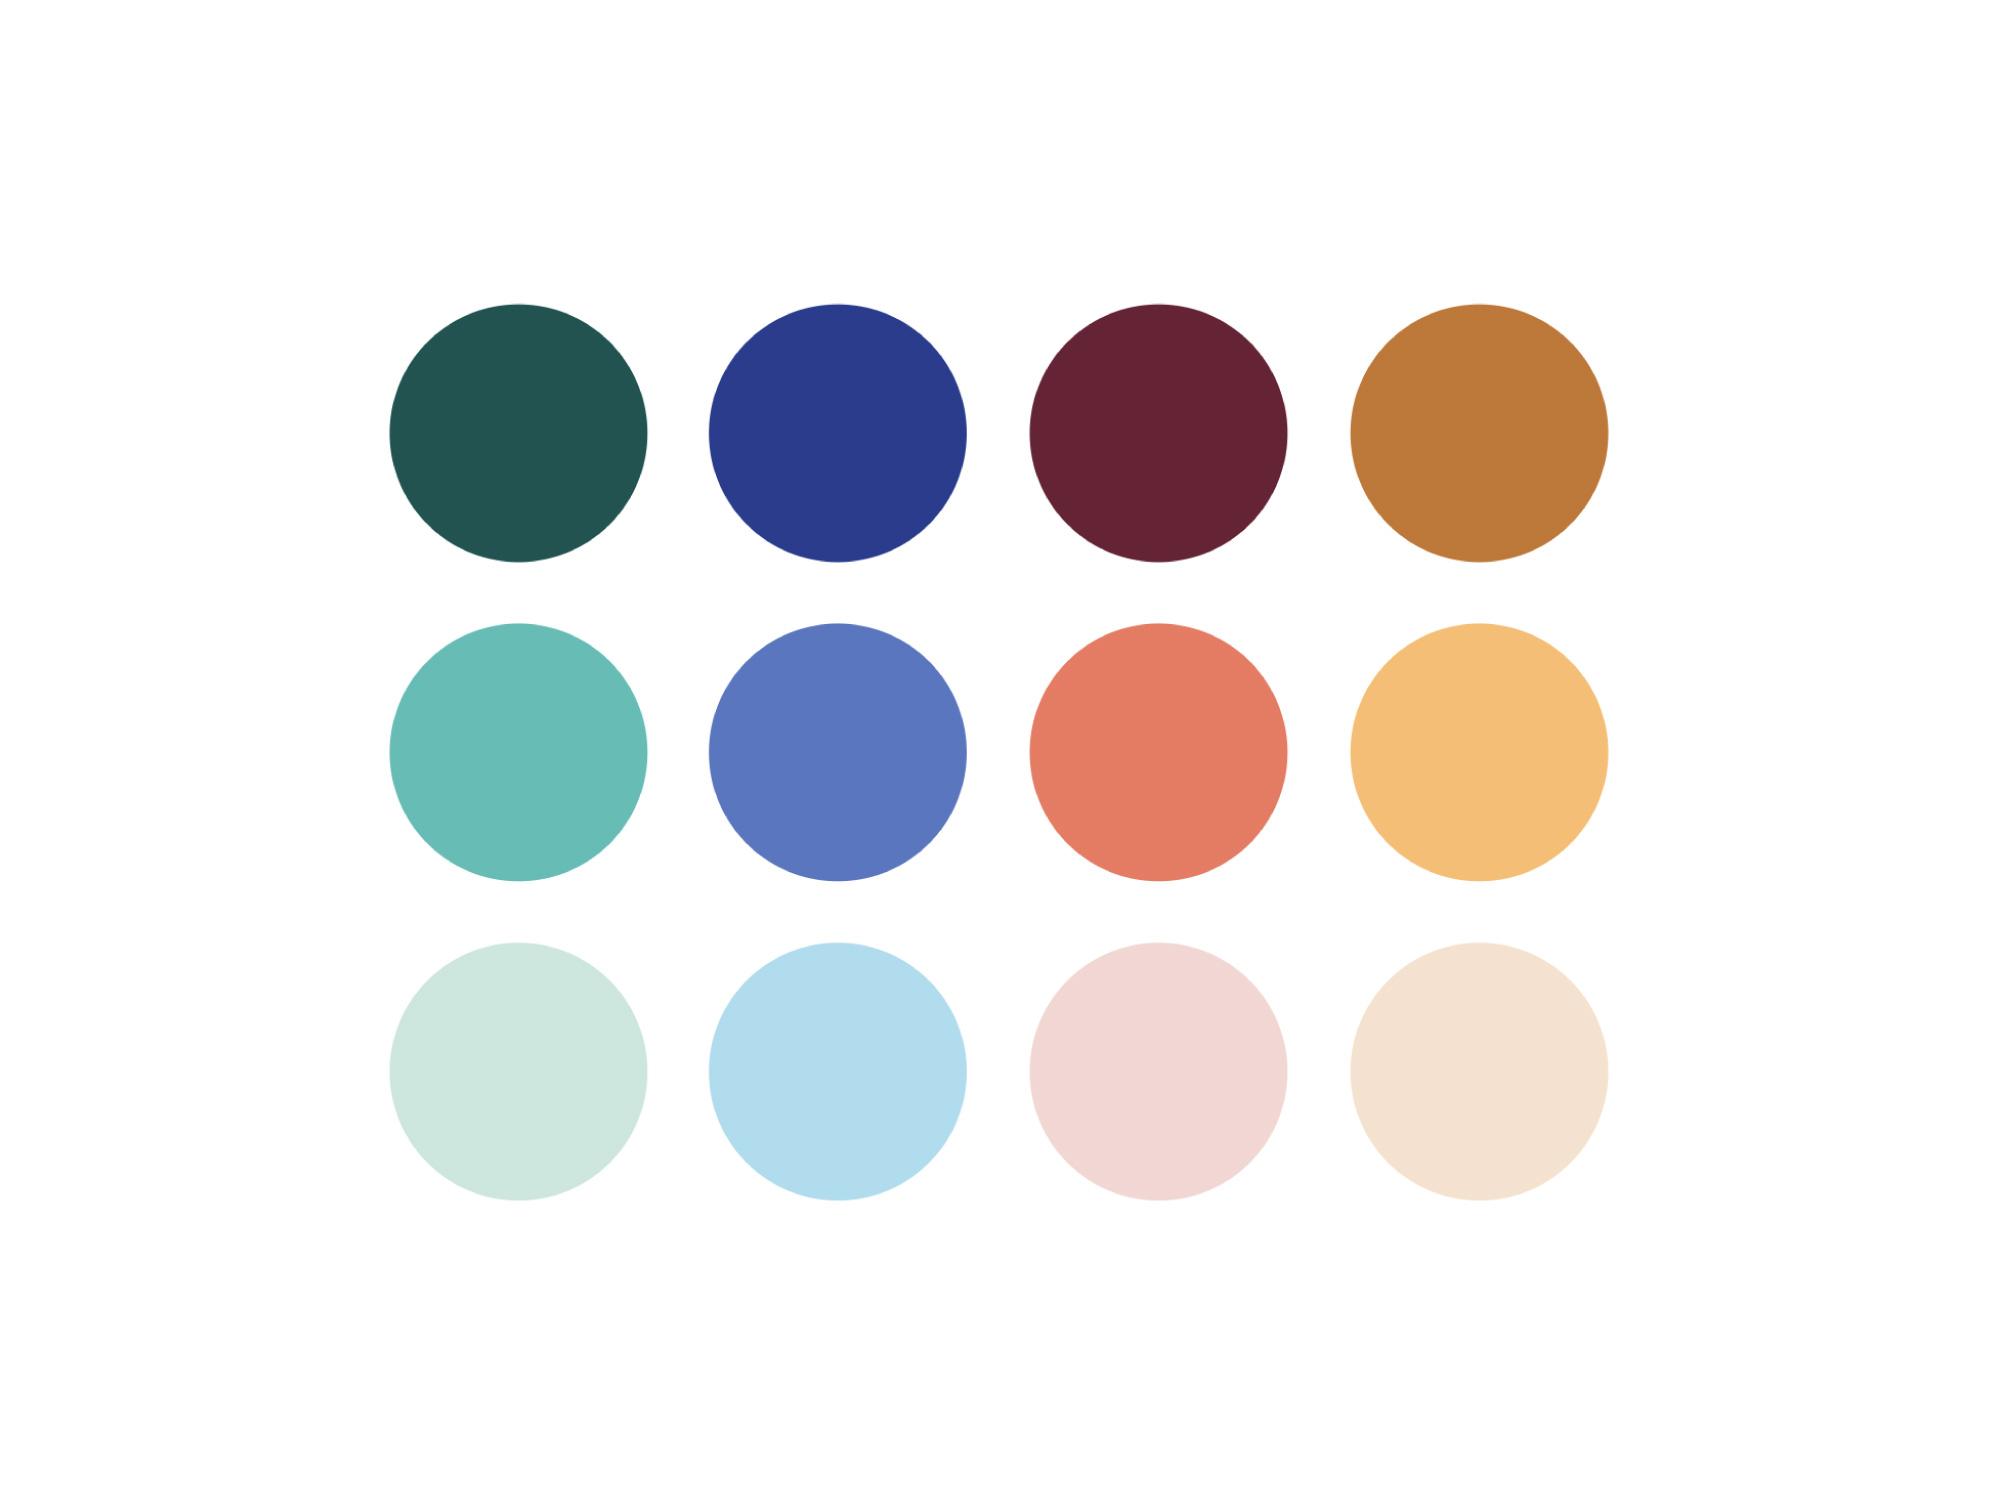 cj-affiliate-2021-brand-refresh-color-palette-FINAL